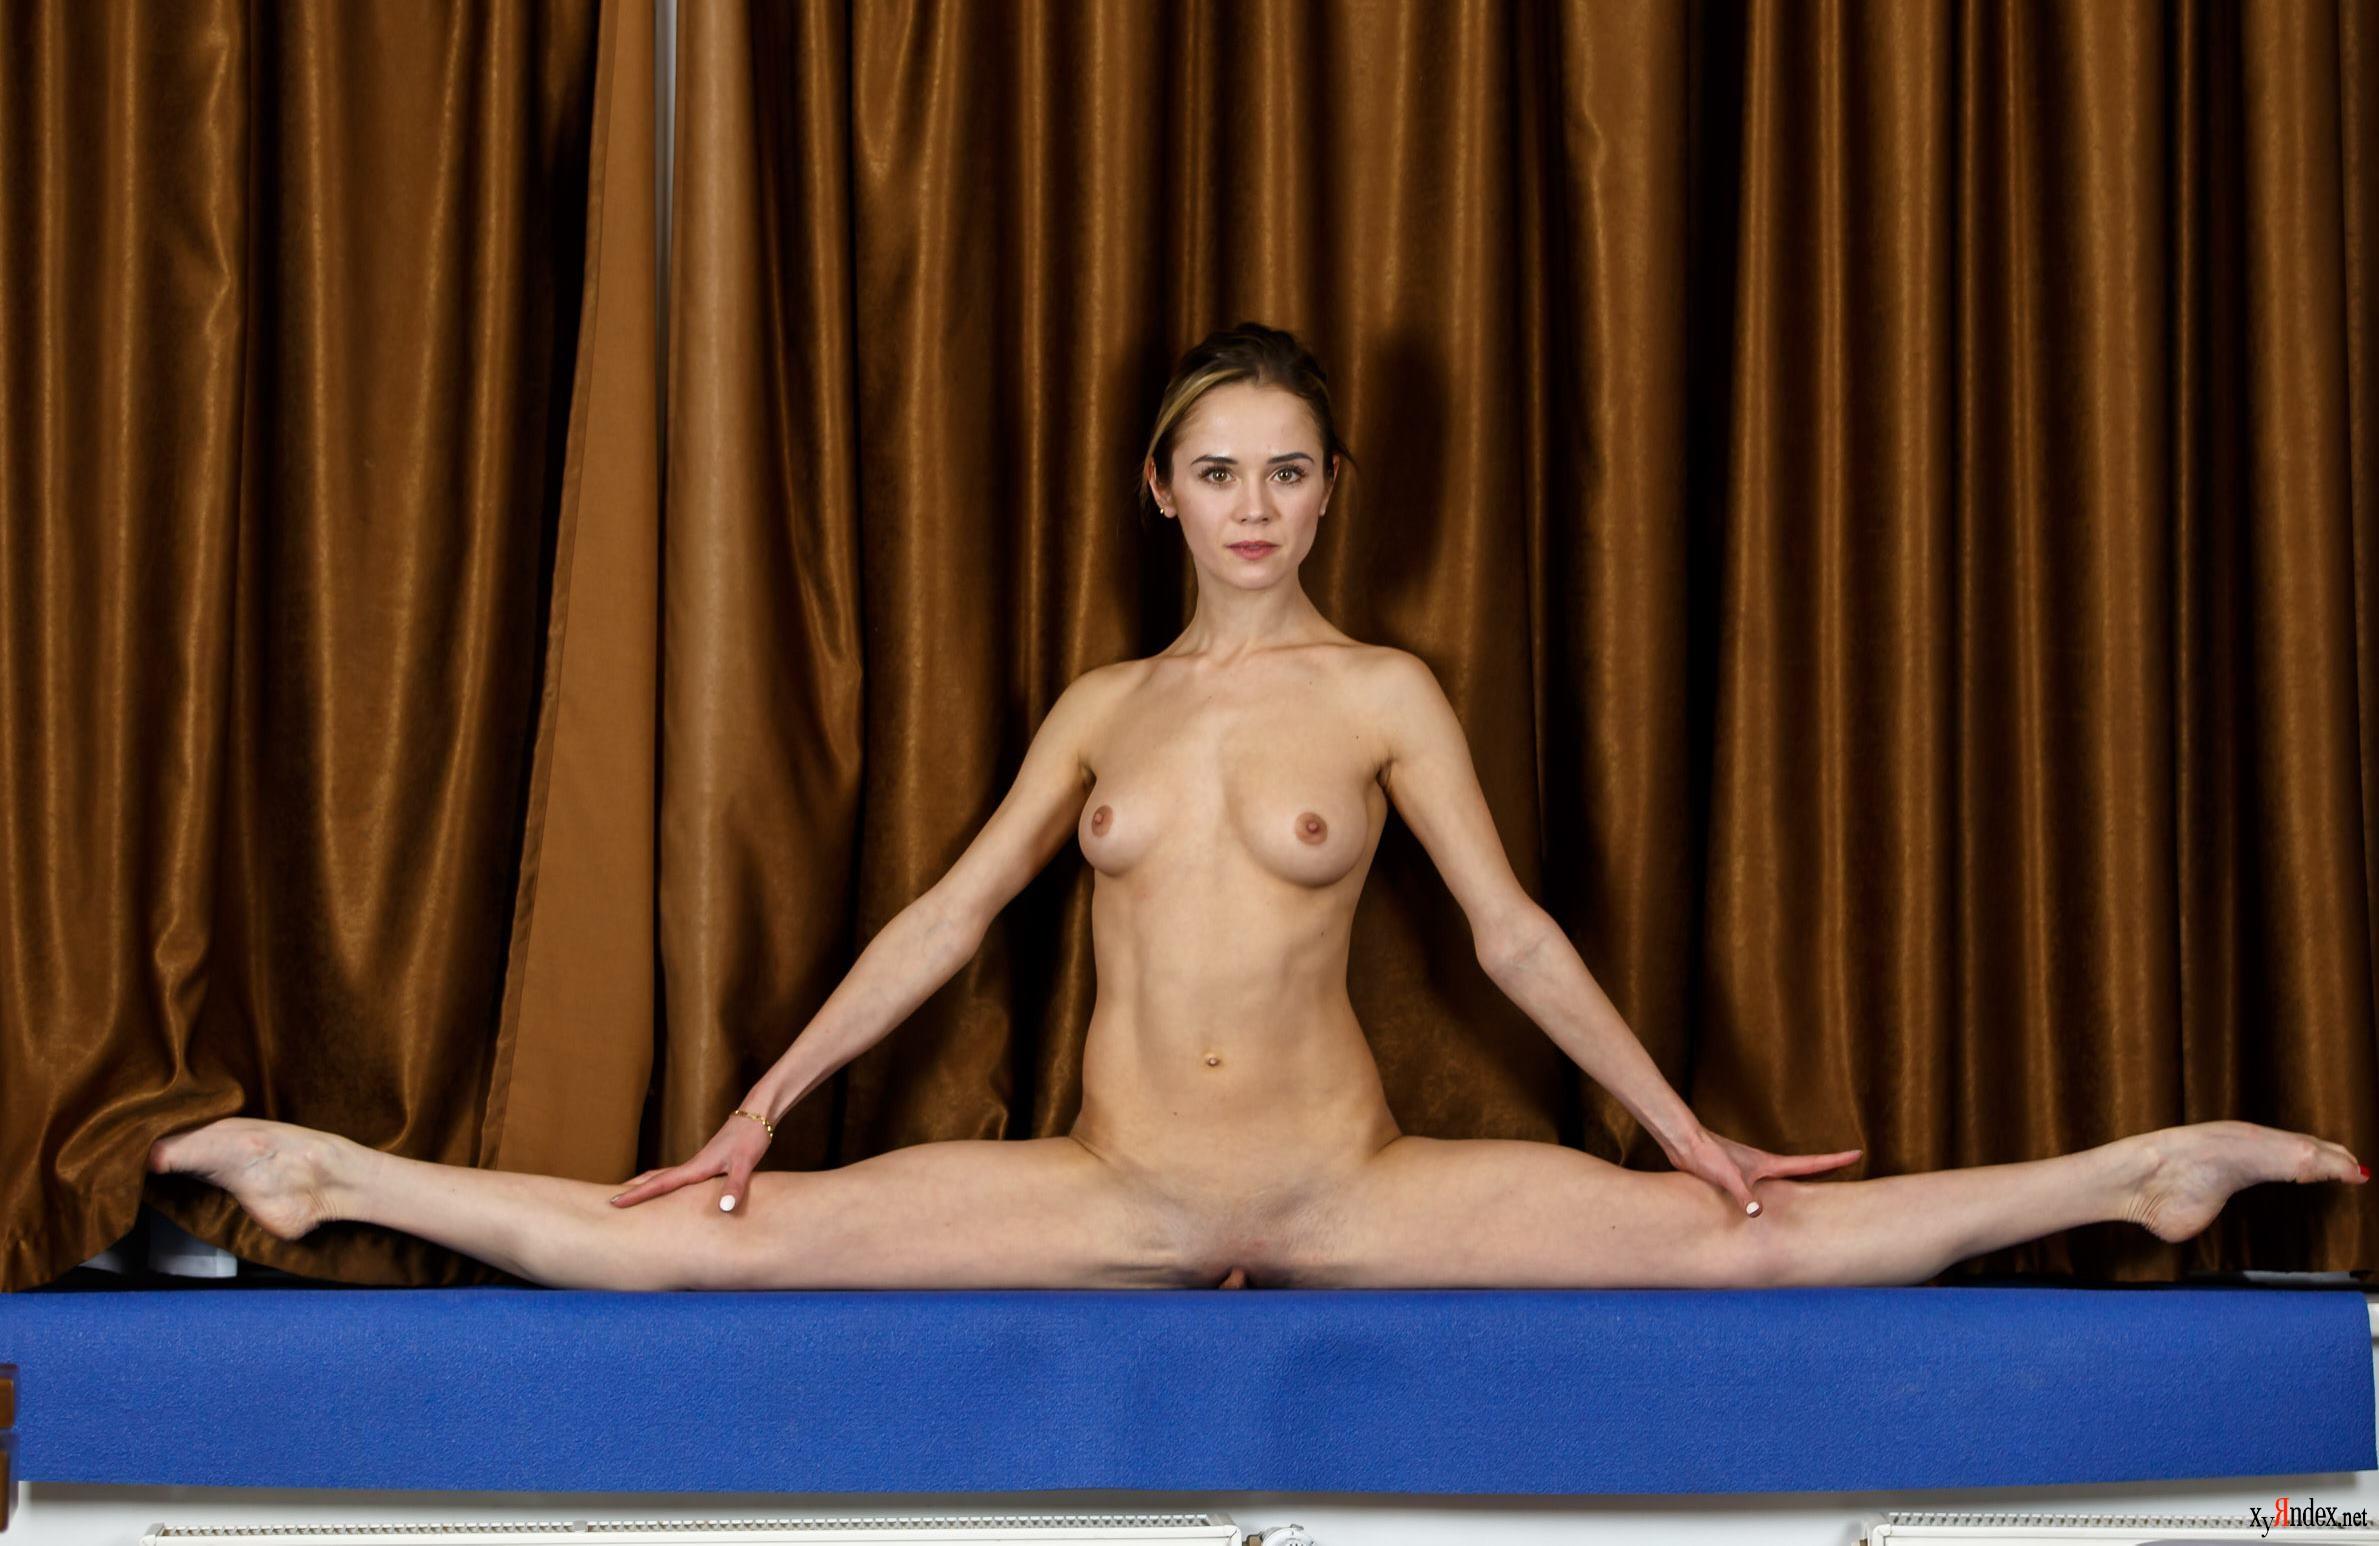 балерина раздевается до гола видео - 12